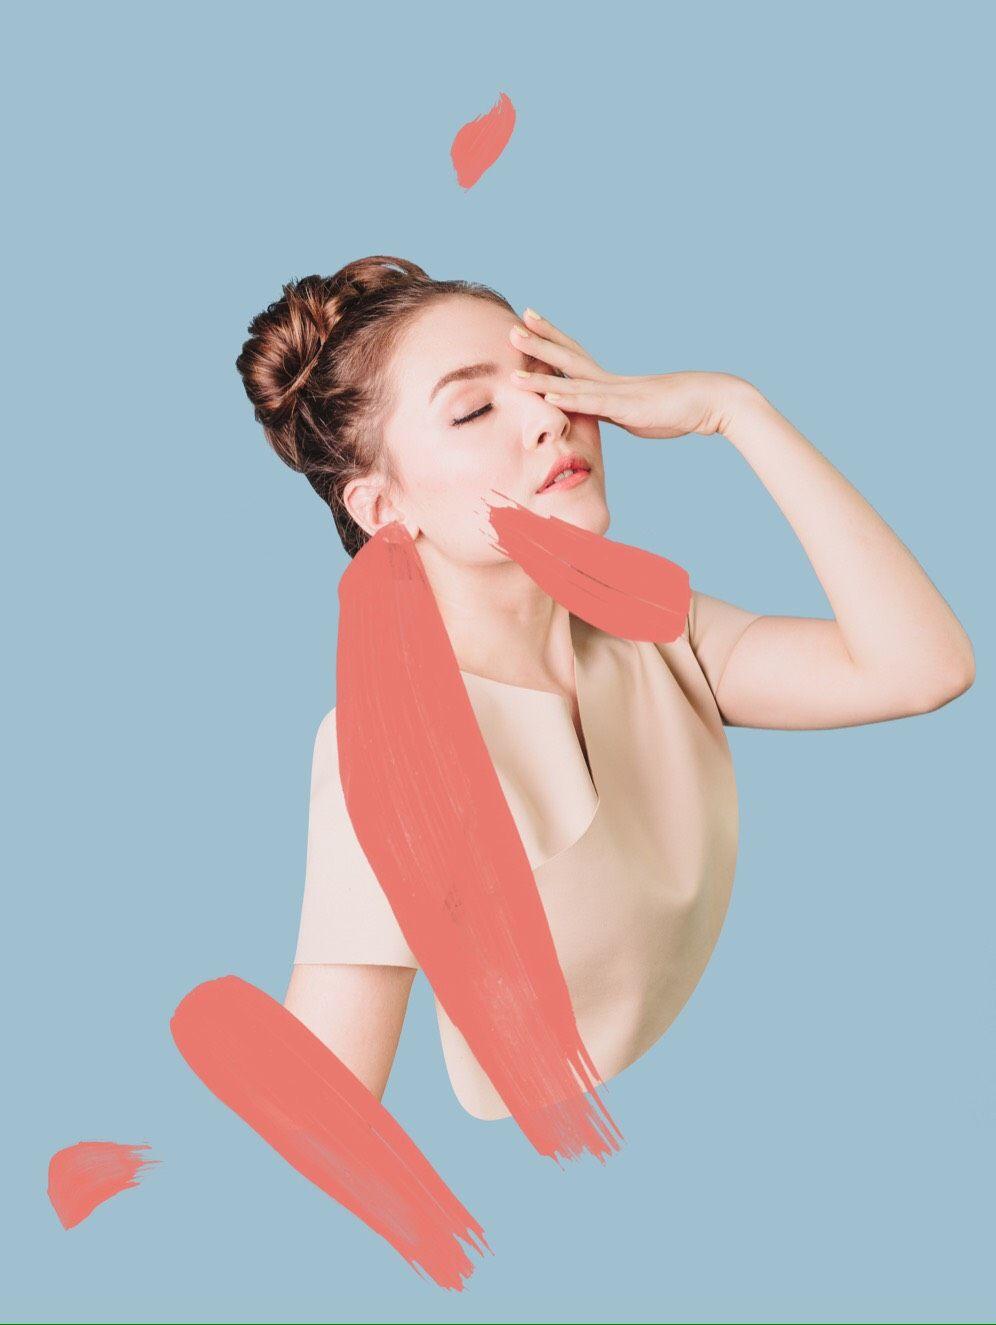 Rollover Reaction Rrcosmetics On Pinterest Sueded Lip And Cheek Cream Saddie